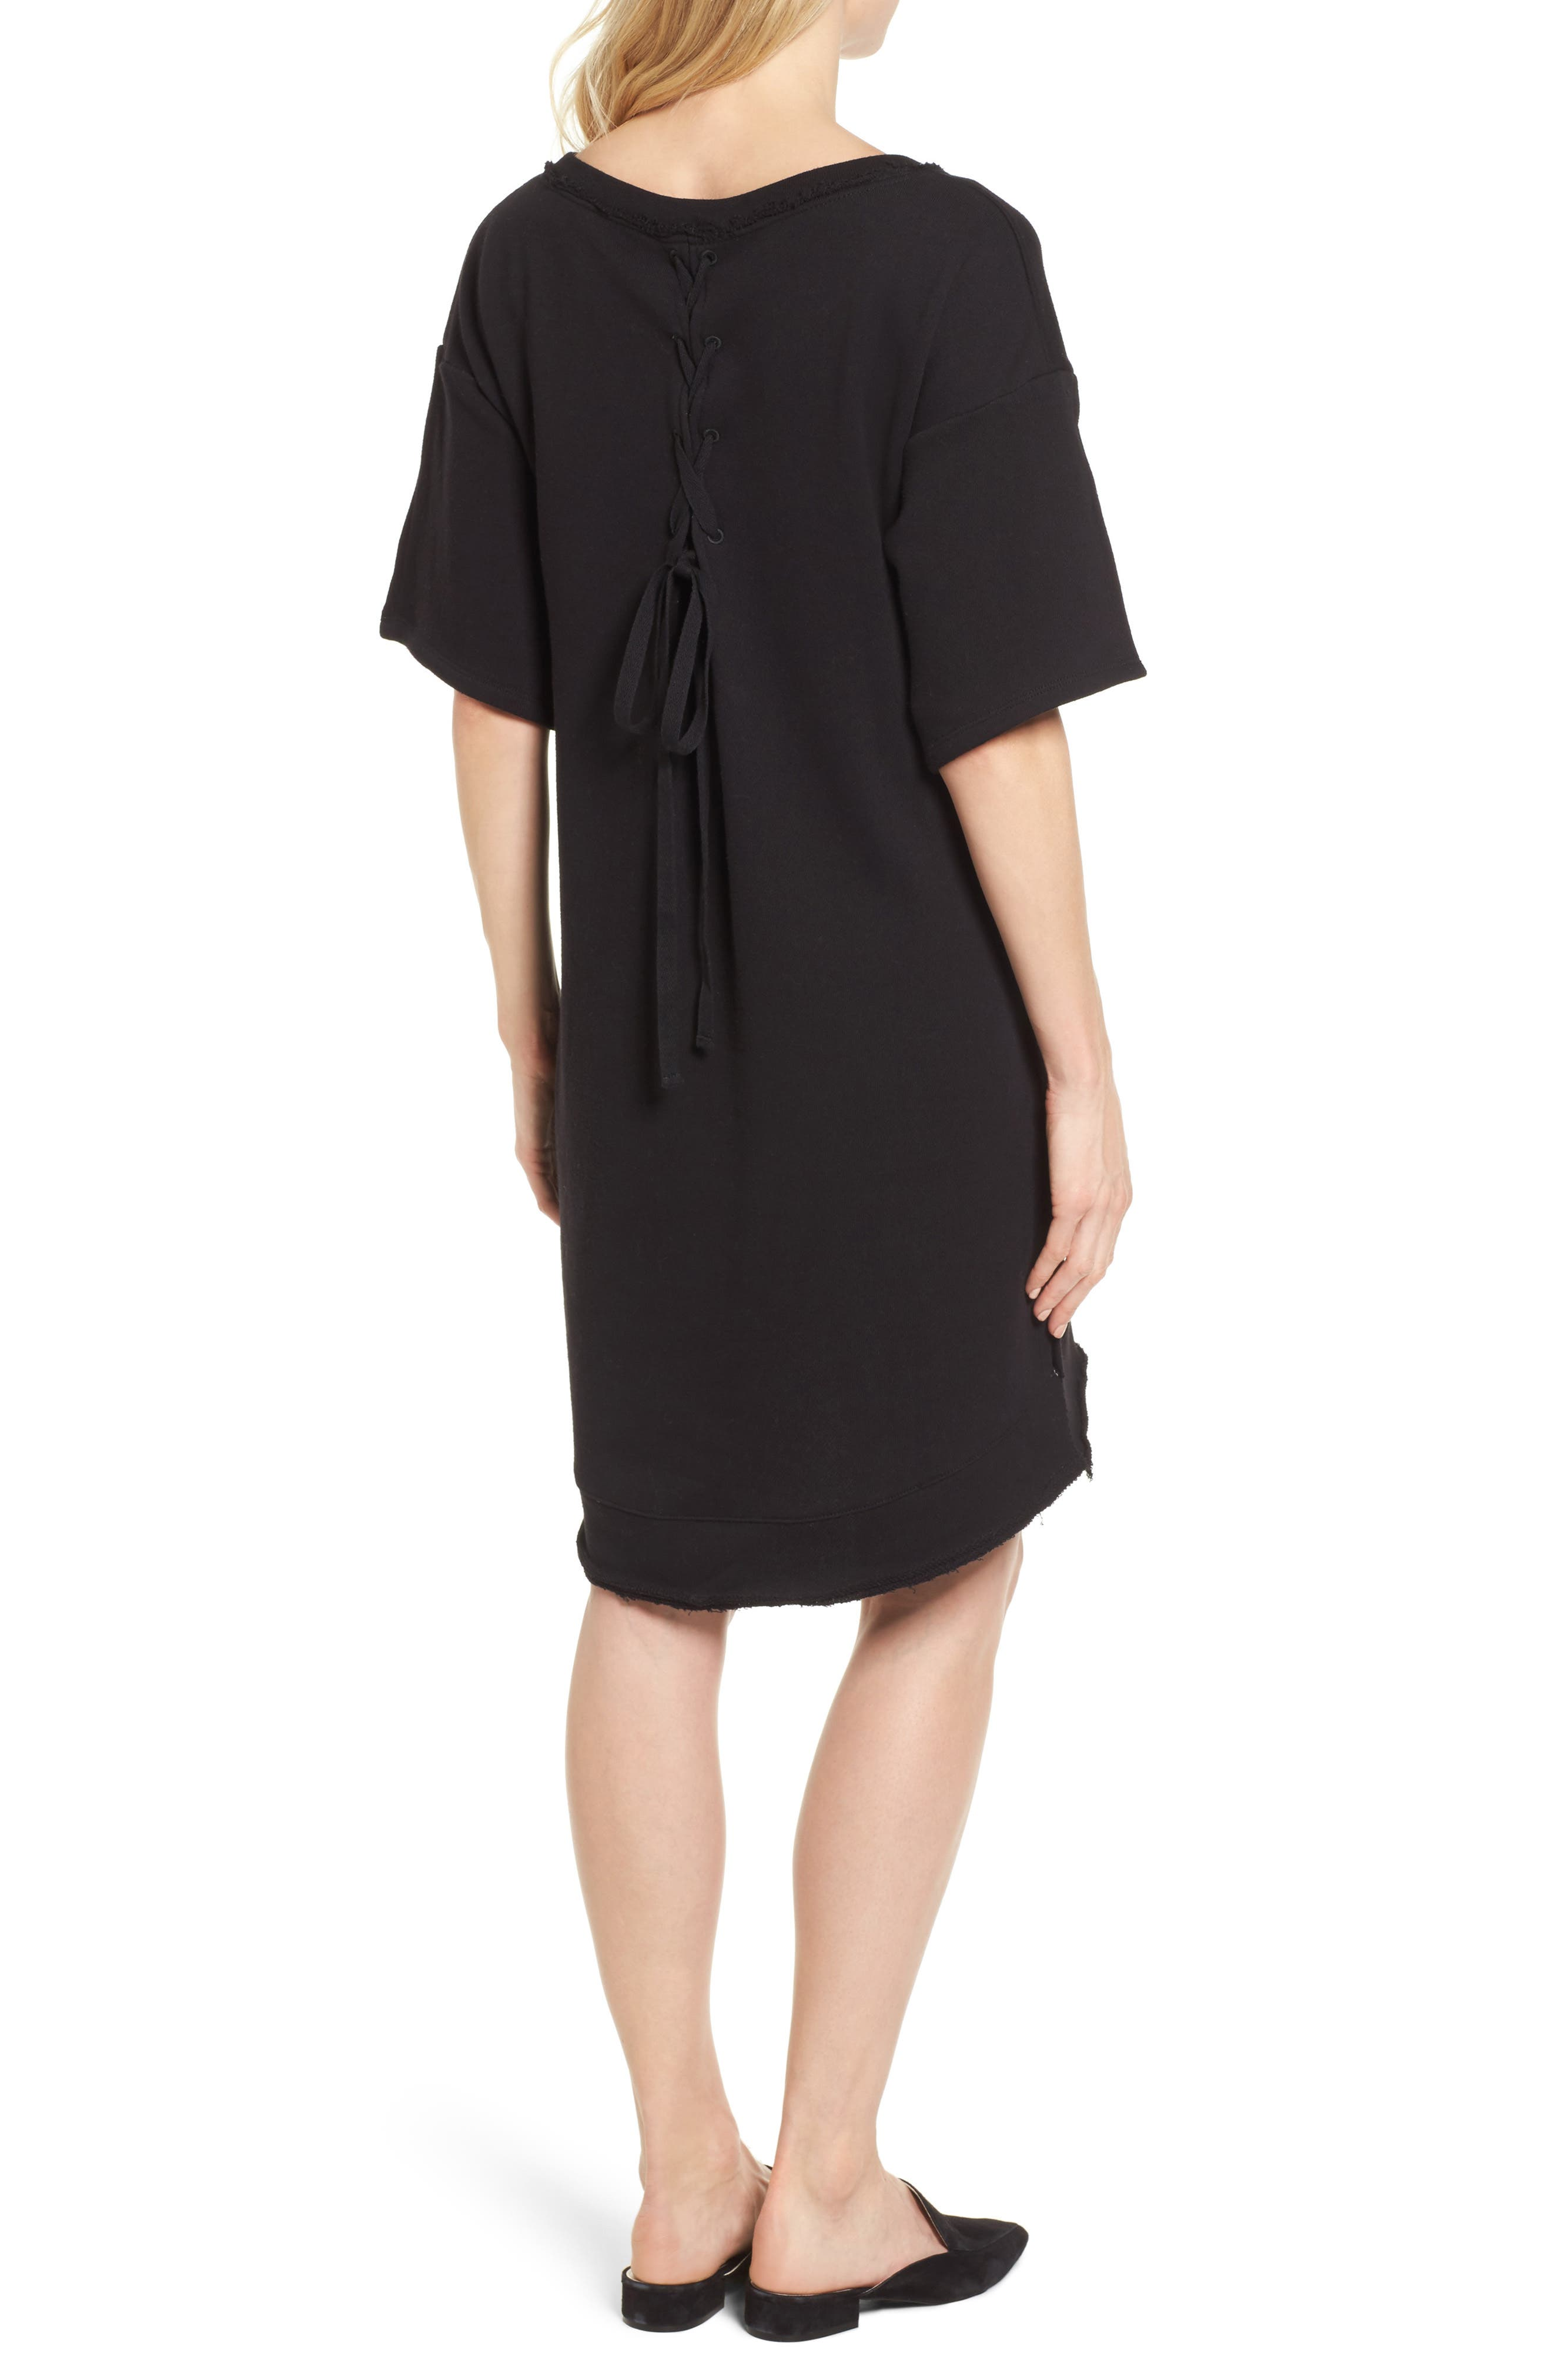 Lace-Up T-Shirt Dress,                             Alternate thumbnail 2, color,                             001